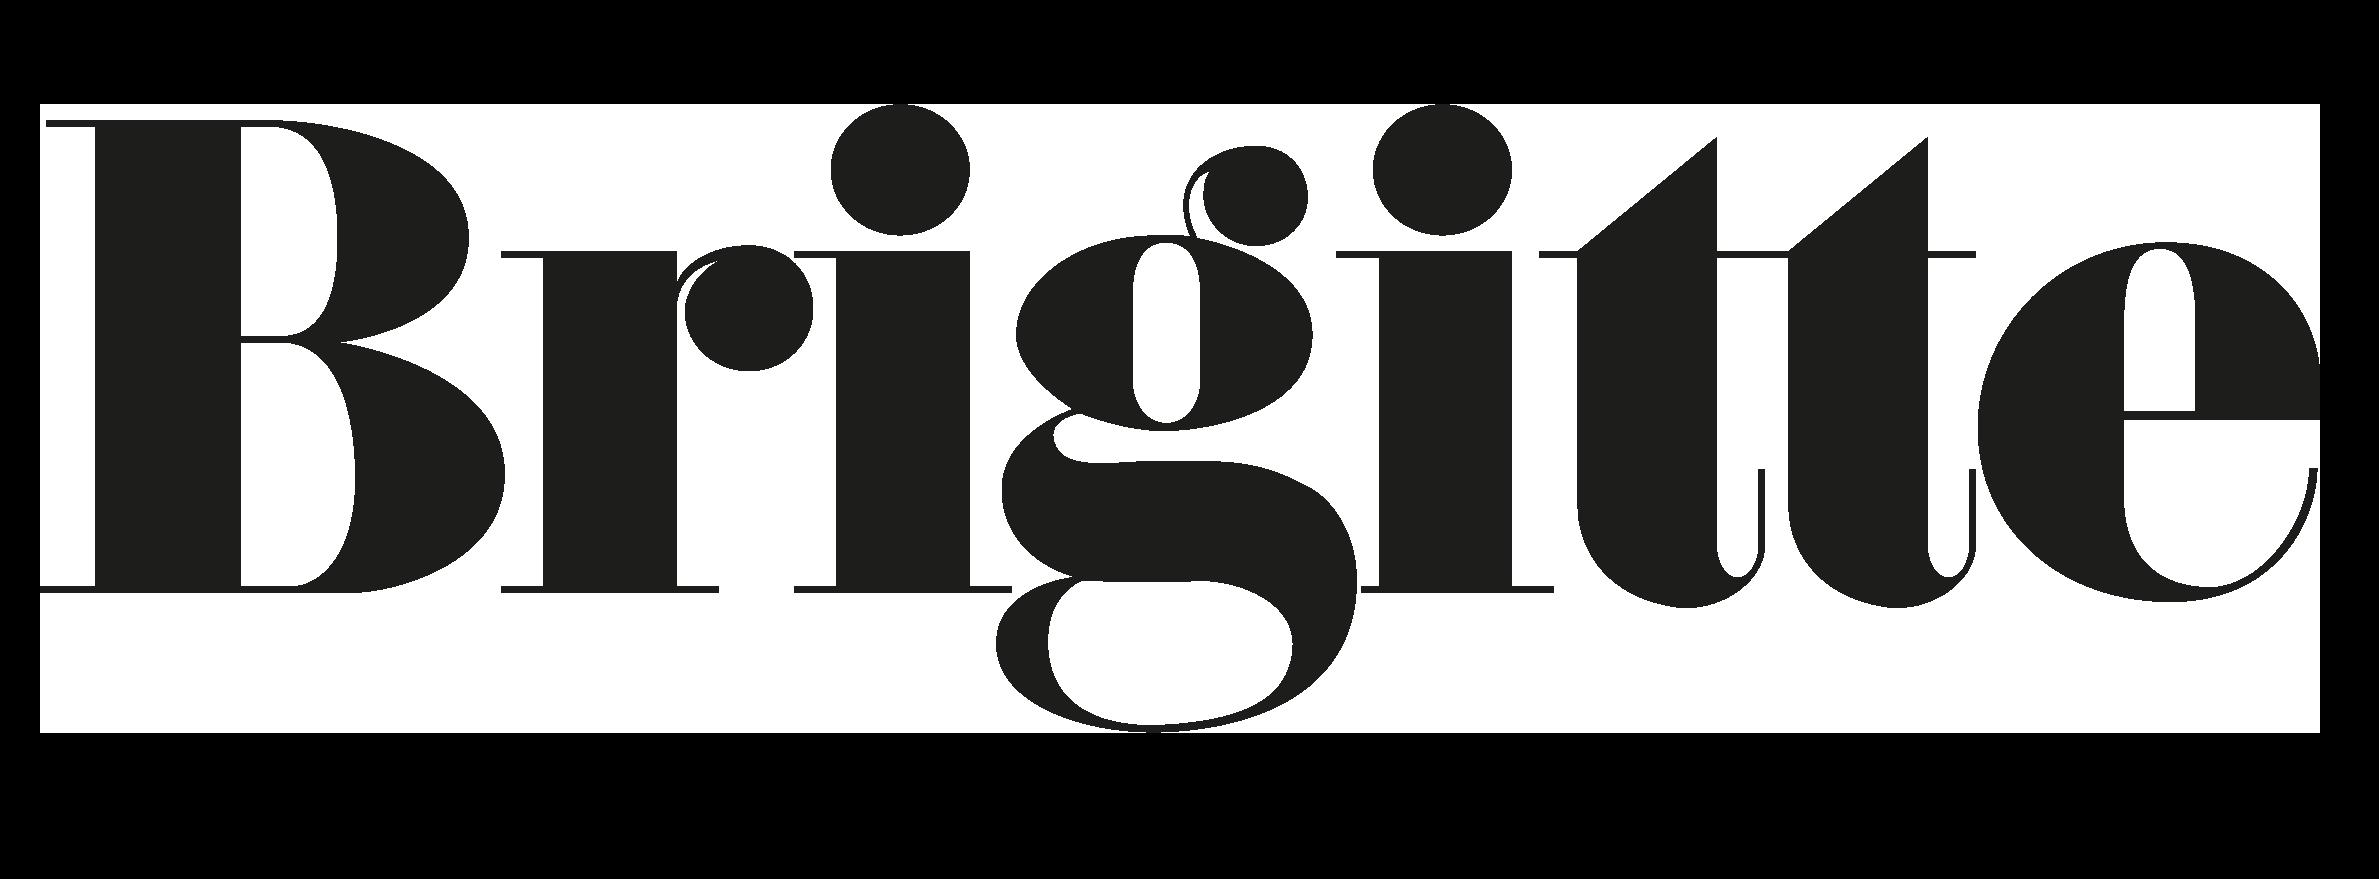 Brigitte Logo